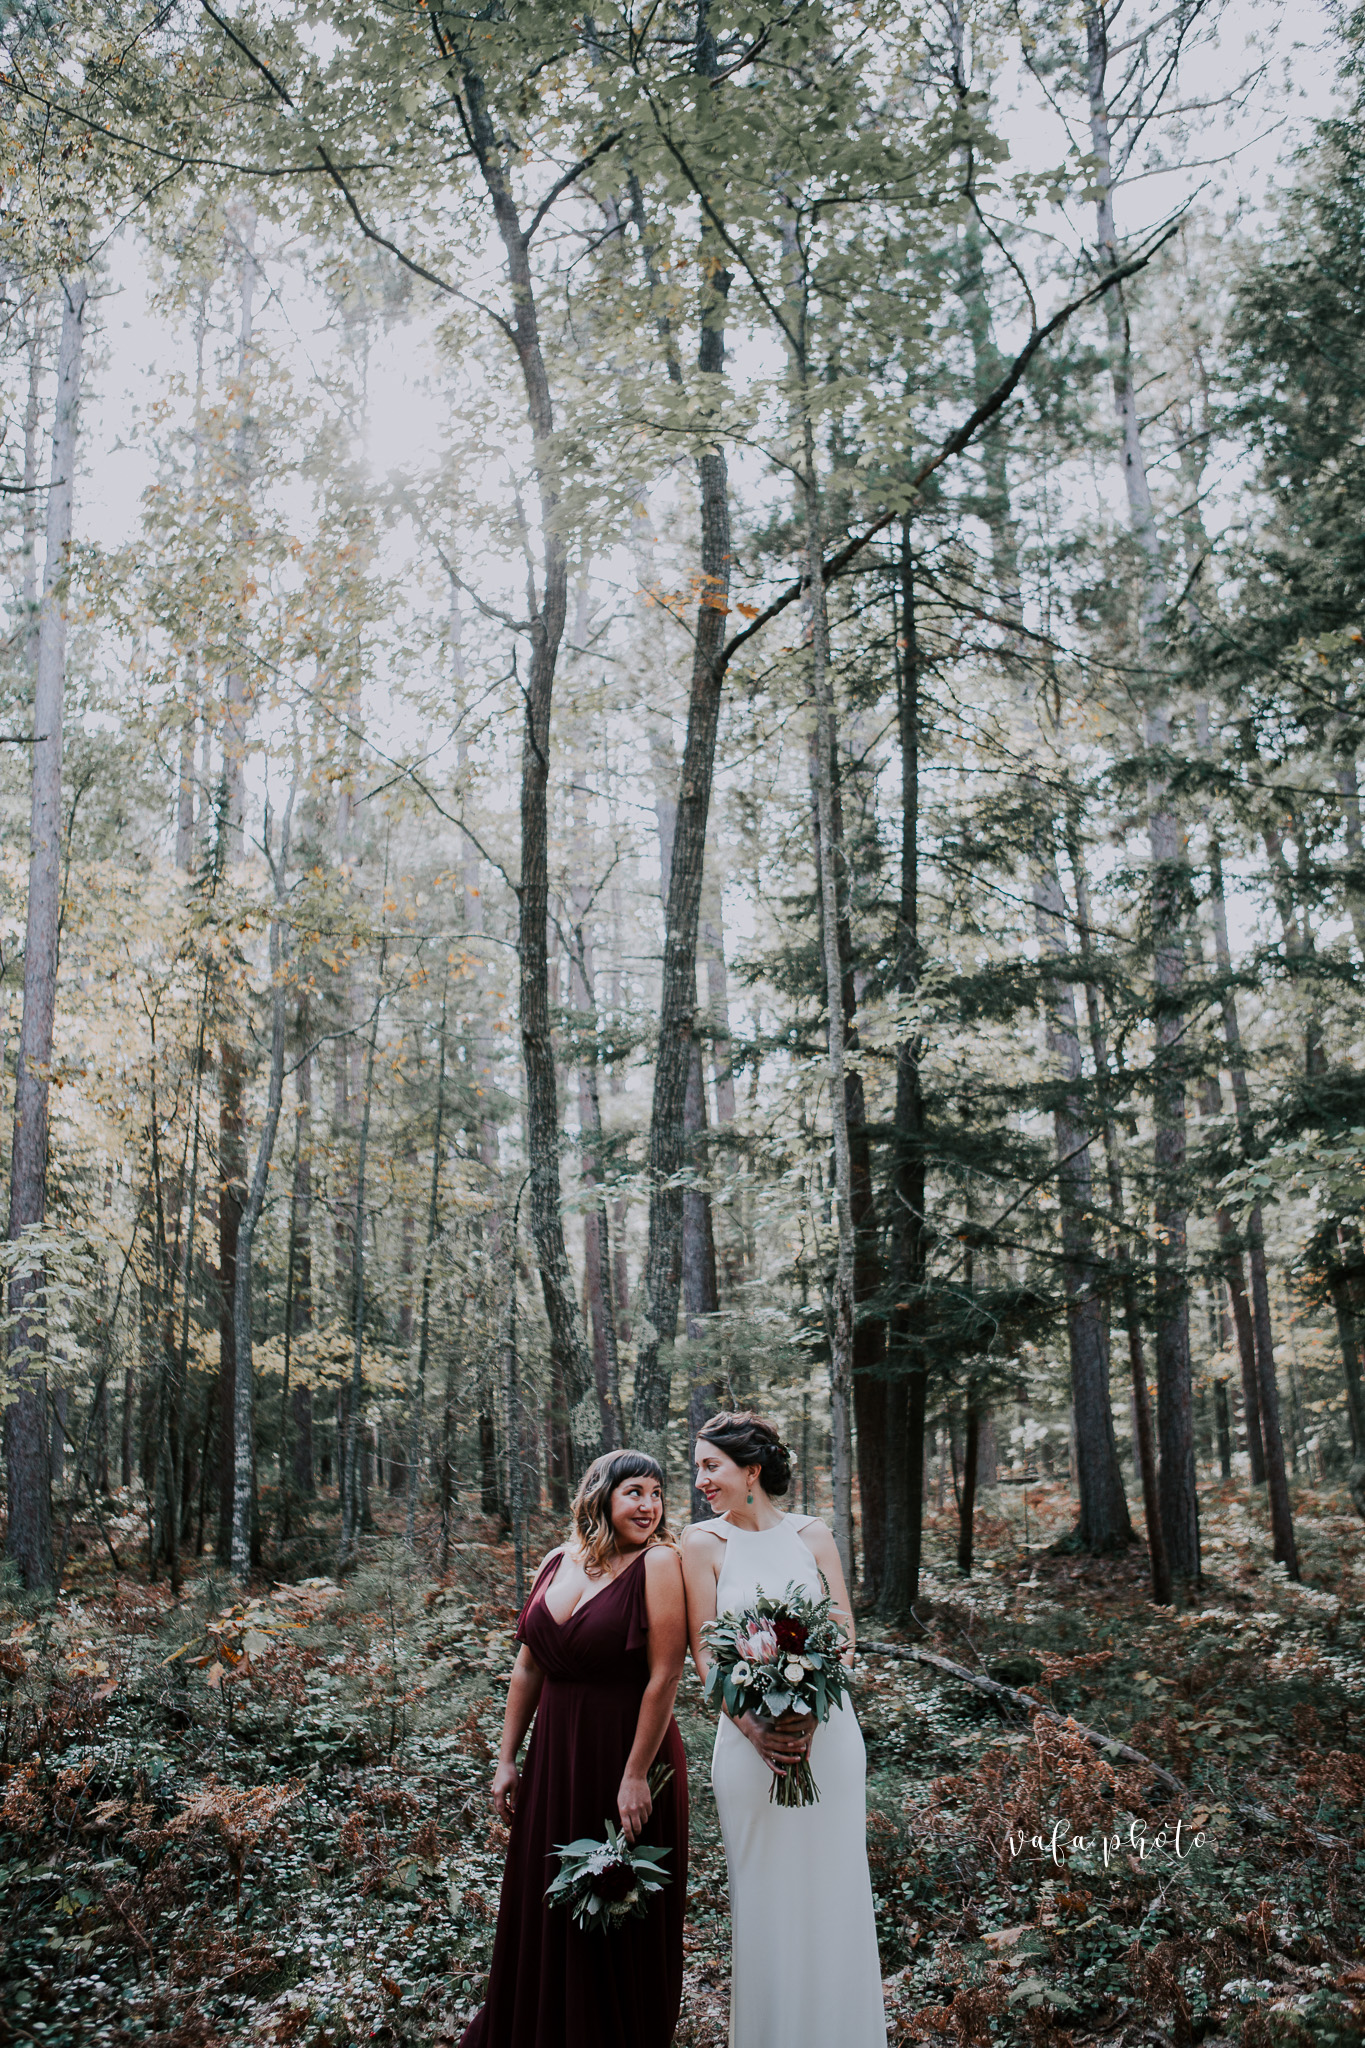 Little-Presque-Isle-Michigan-Wedding-Kim-Kyle-Vafa-Photo-157.jpg